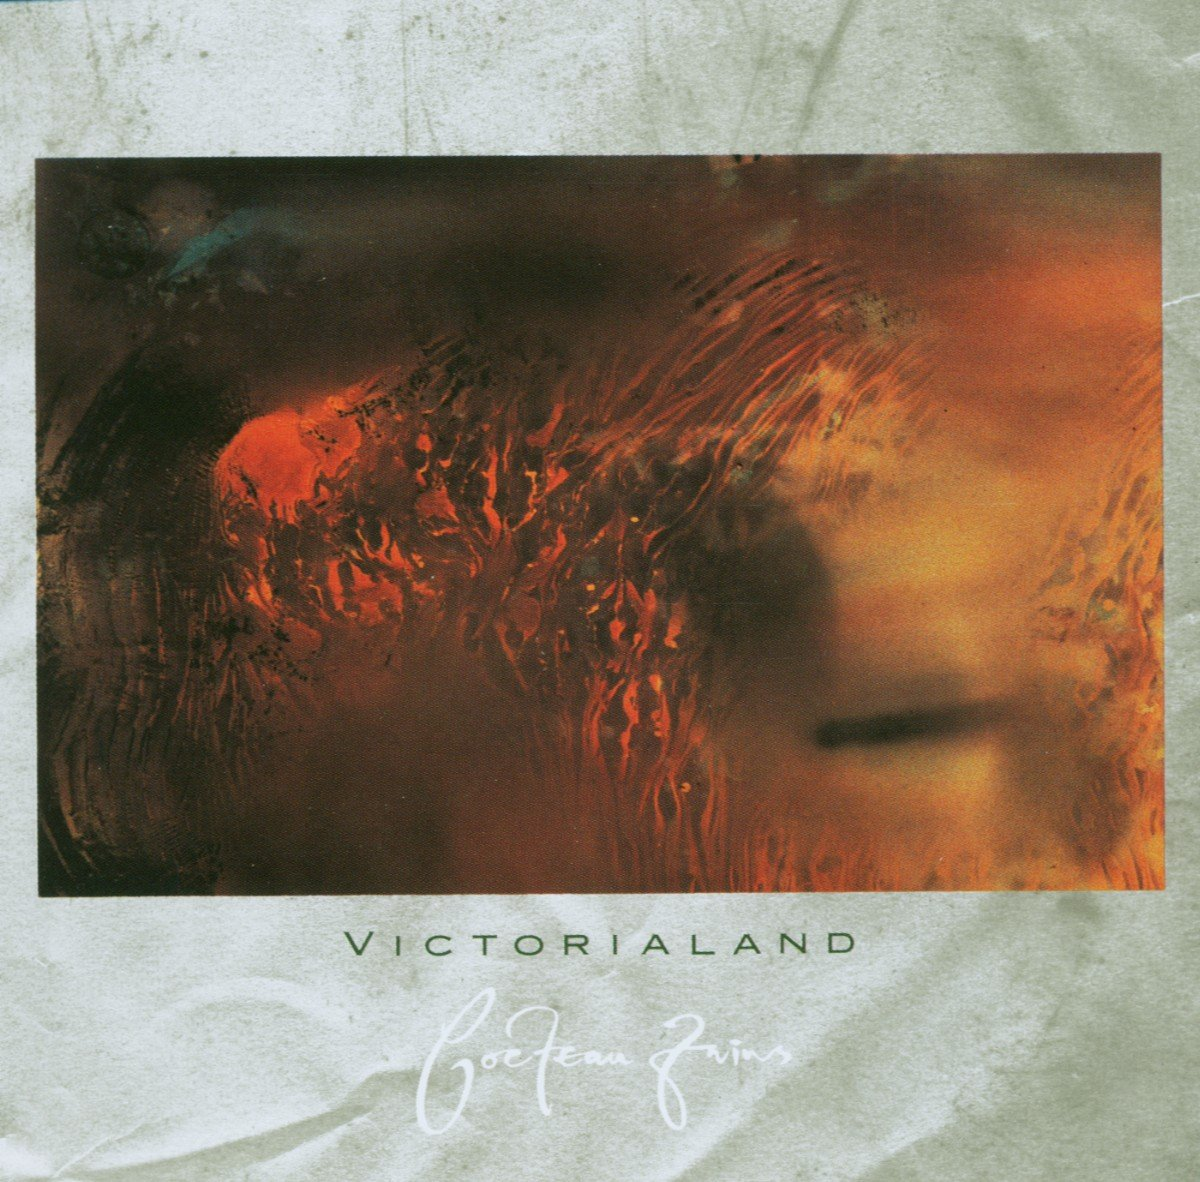 Cocteau Twins Prepare Vinyl Represses Of Garlands And Victorialand